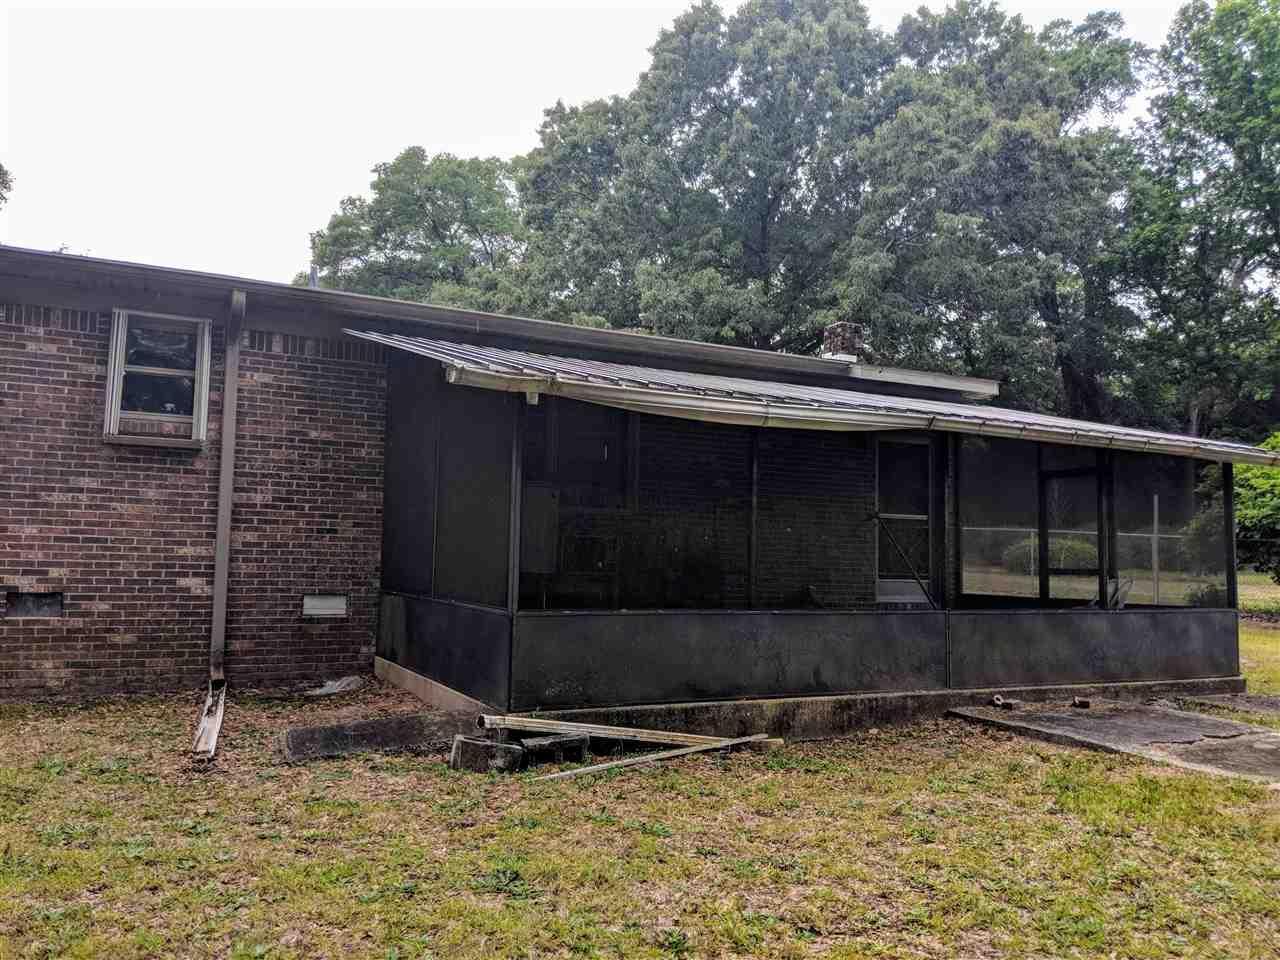 7130 N Blue Angel Pkwy, Pensacola, FL 32526